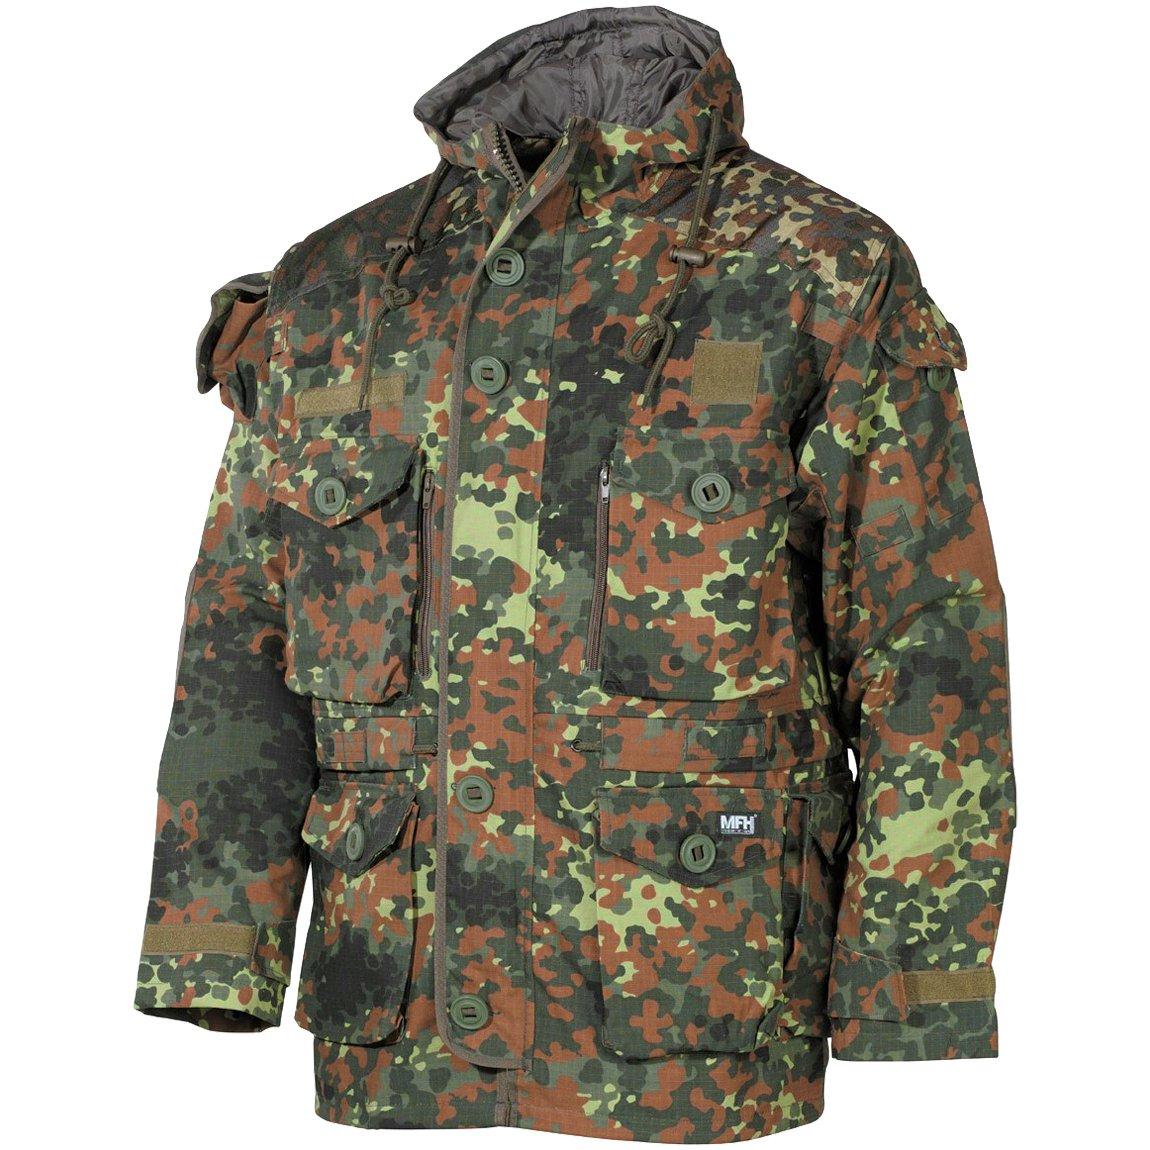 MFH Men's Commando Jacket Smock Flecktarn Size M